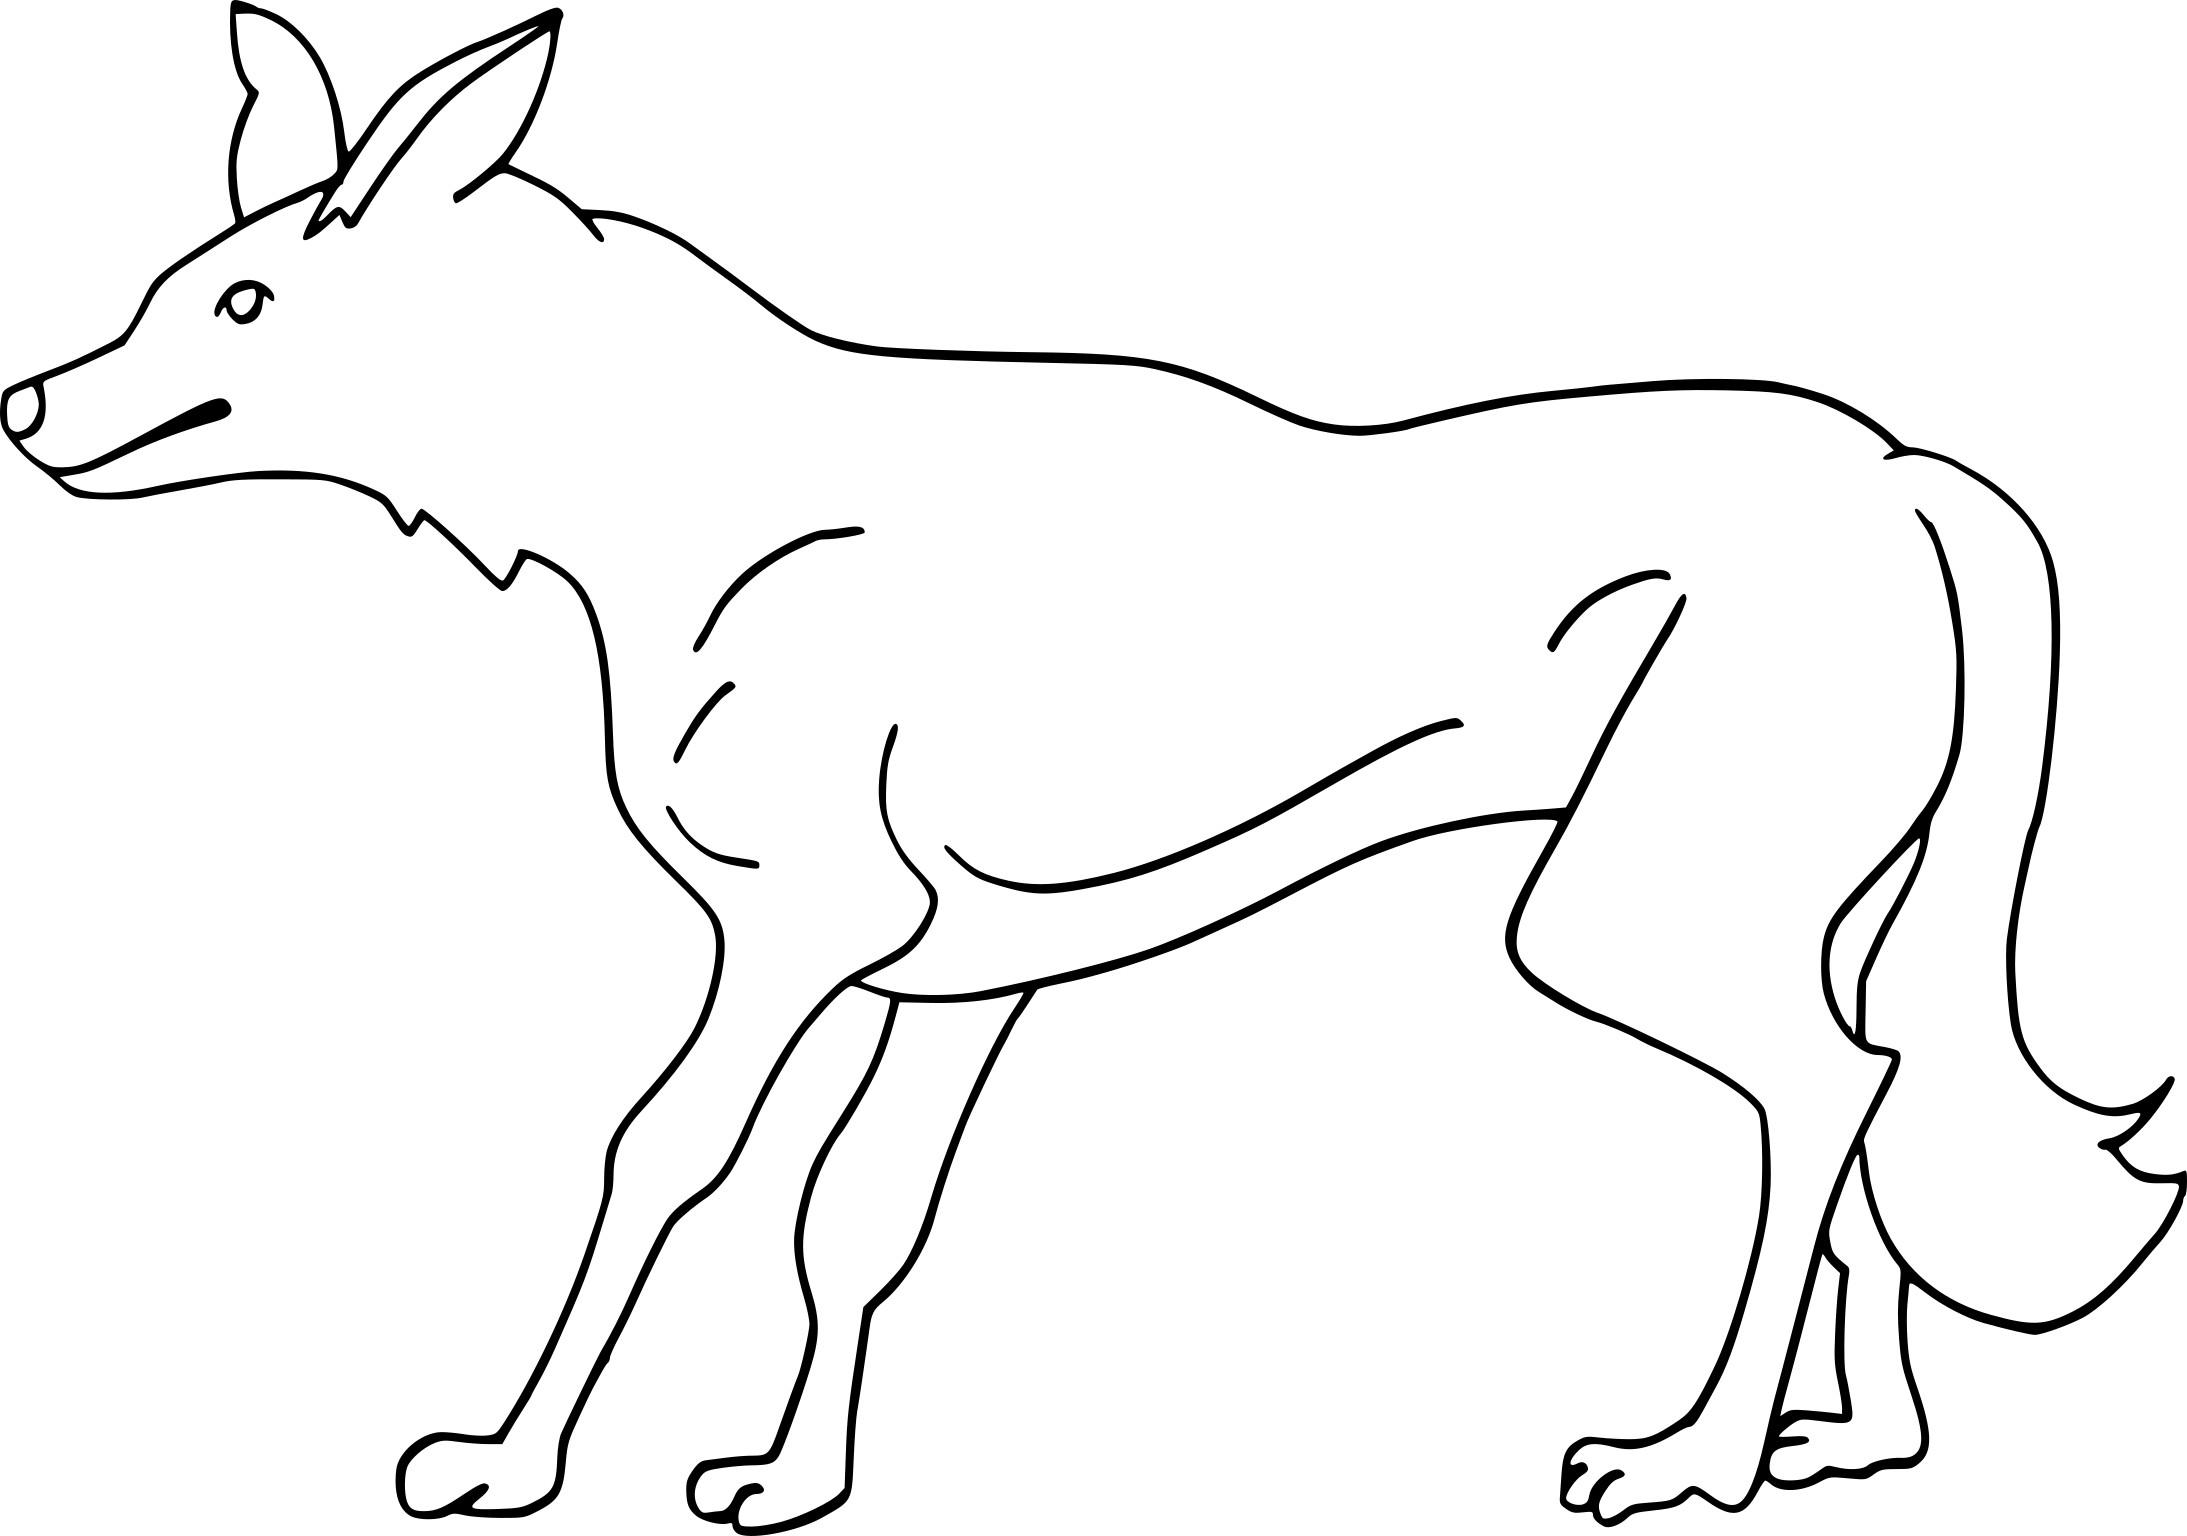 Coloriage coyote et dessin imprimer - Dessin de coyote ...